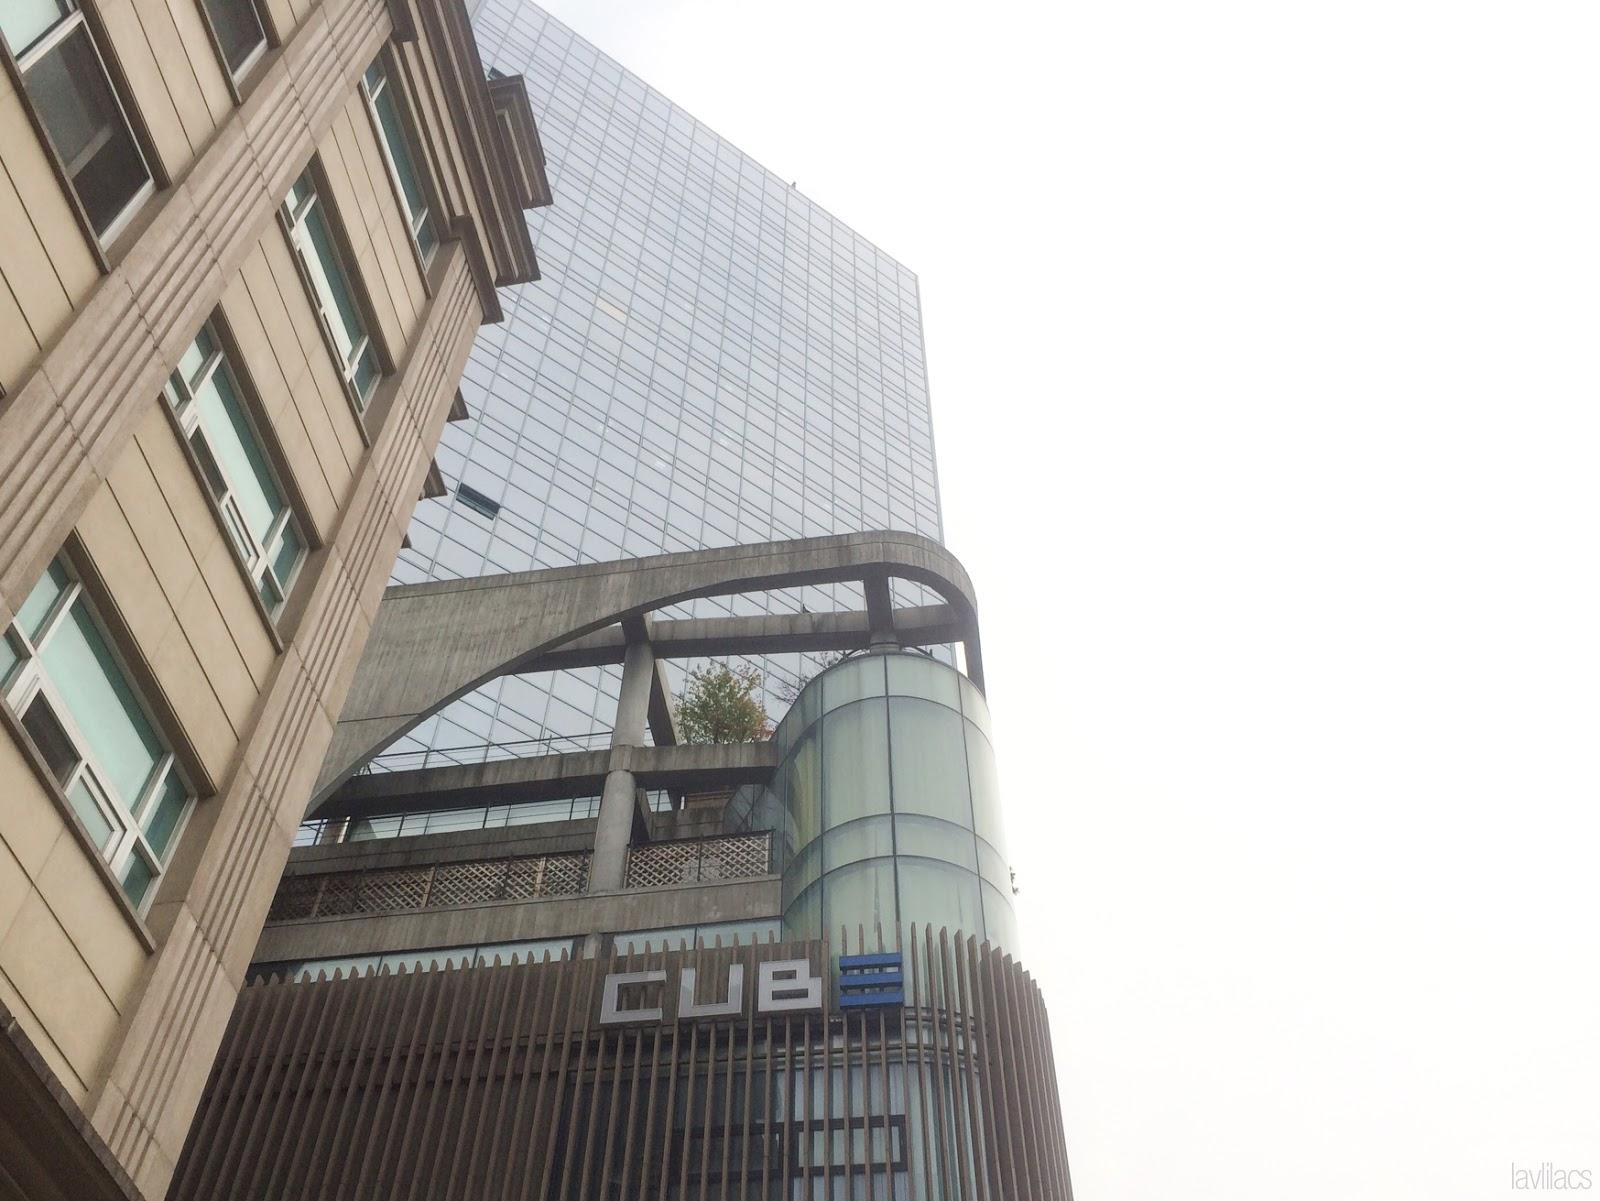 Seoul, Korea - Summer Study Abroad 2014 - Cube Entertainment building